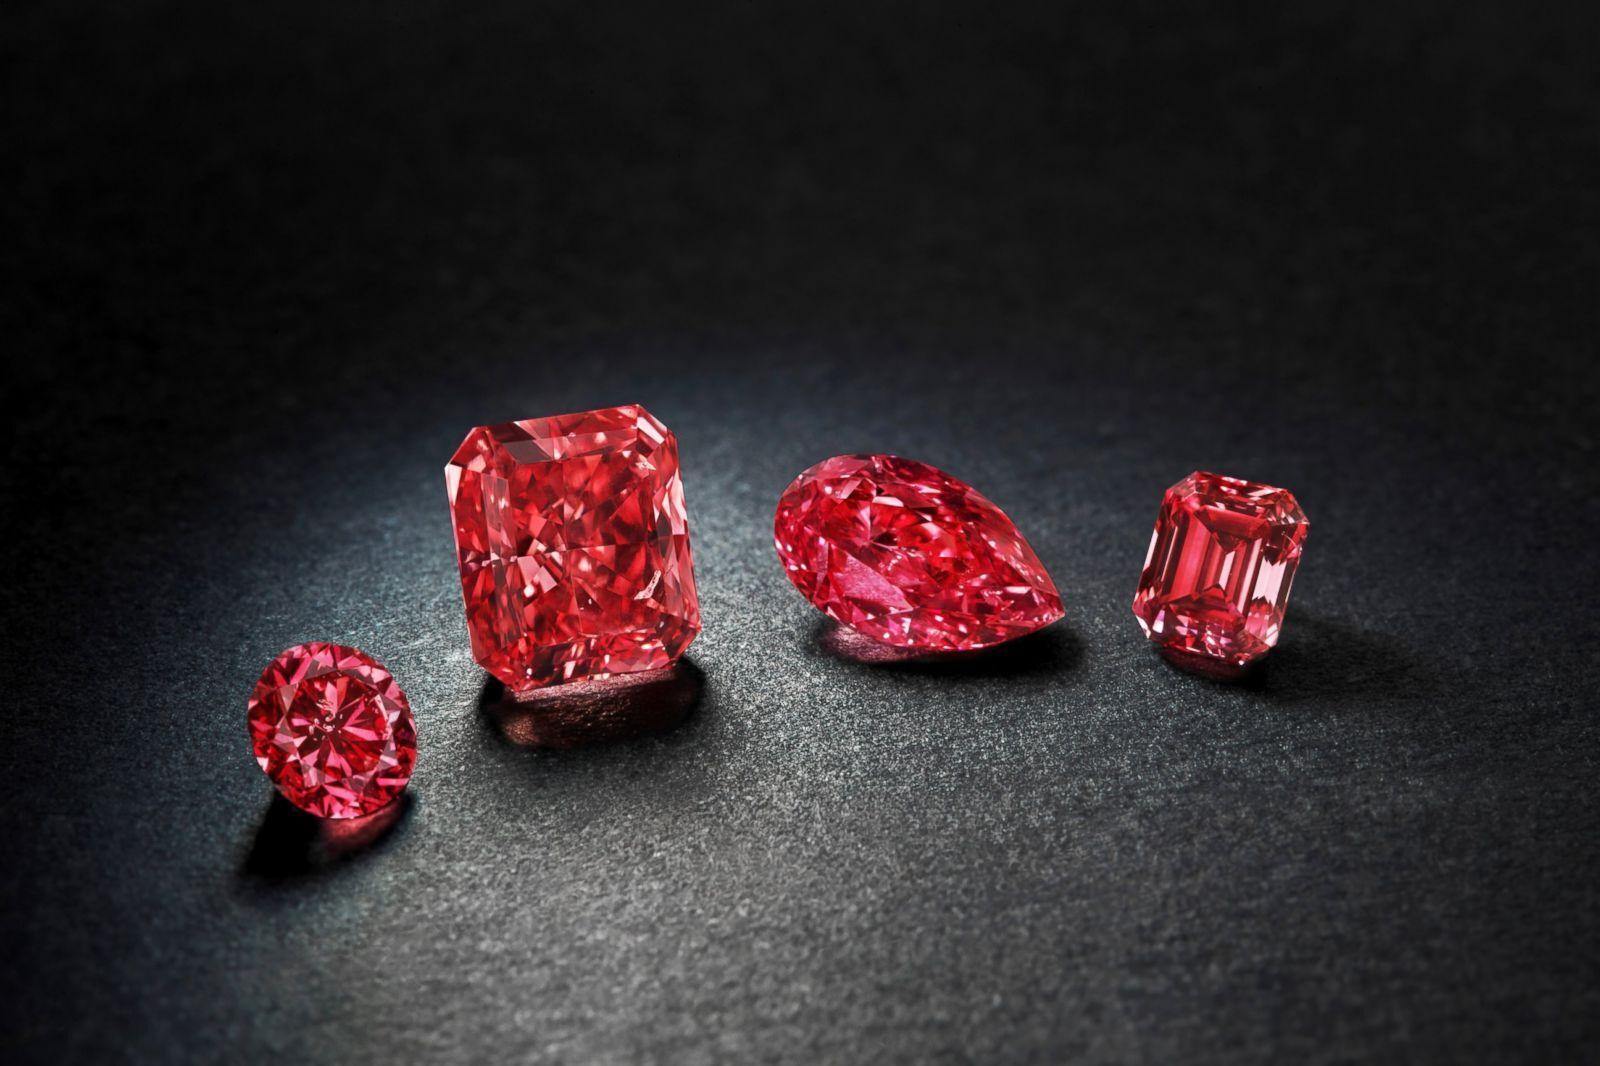 Red Diamonds Rio Tinto